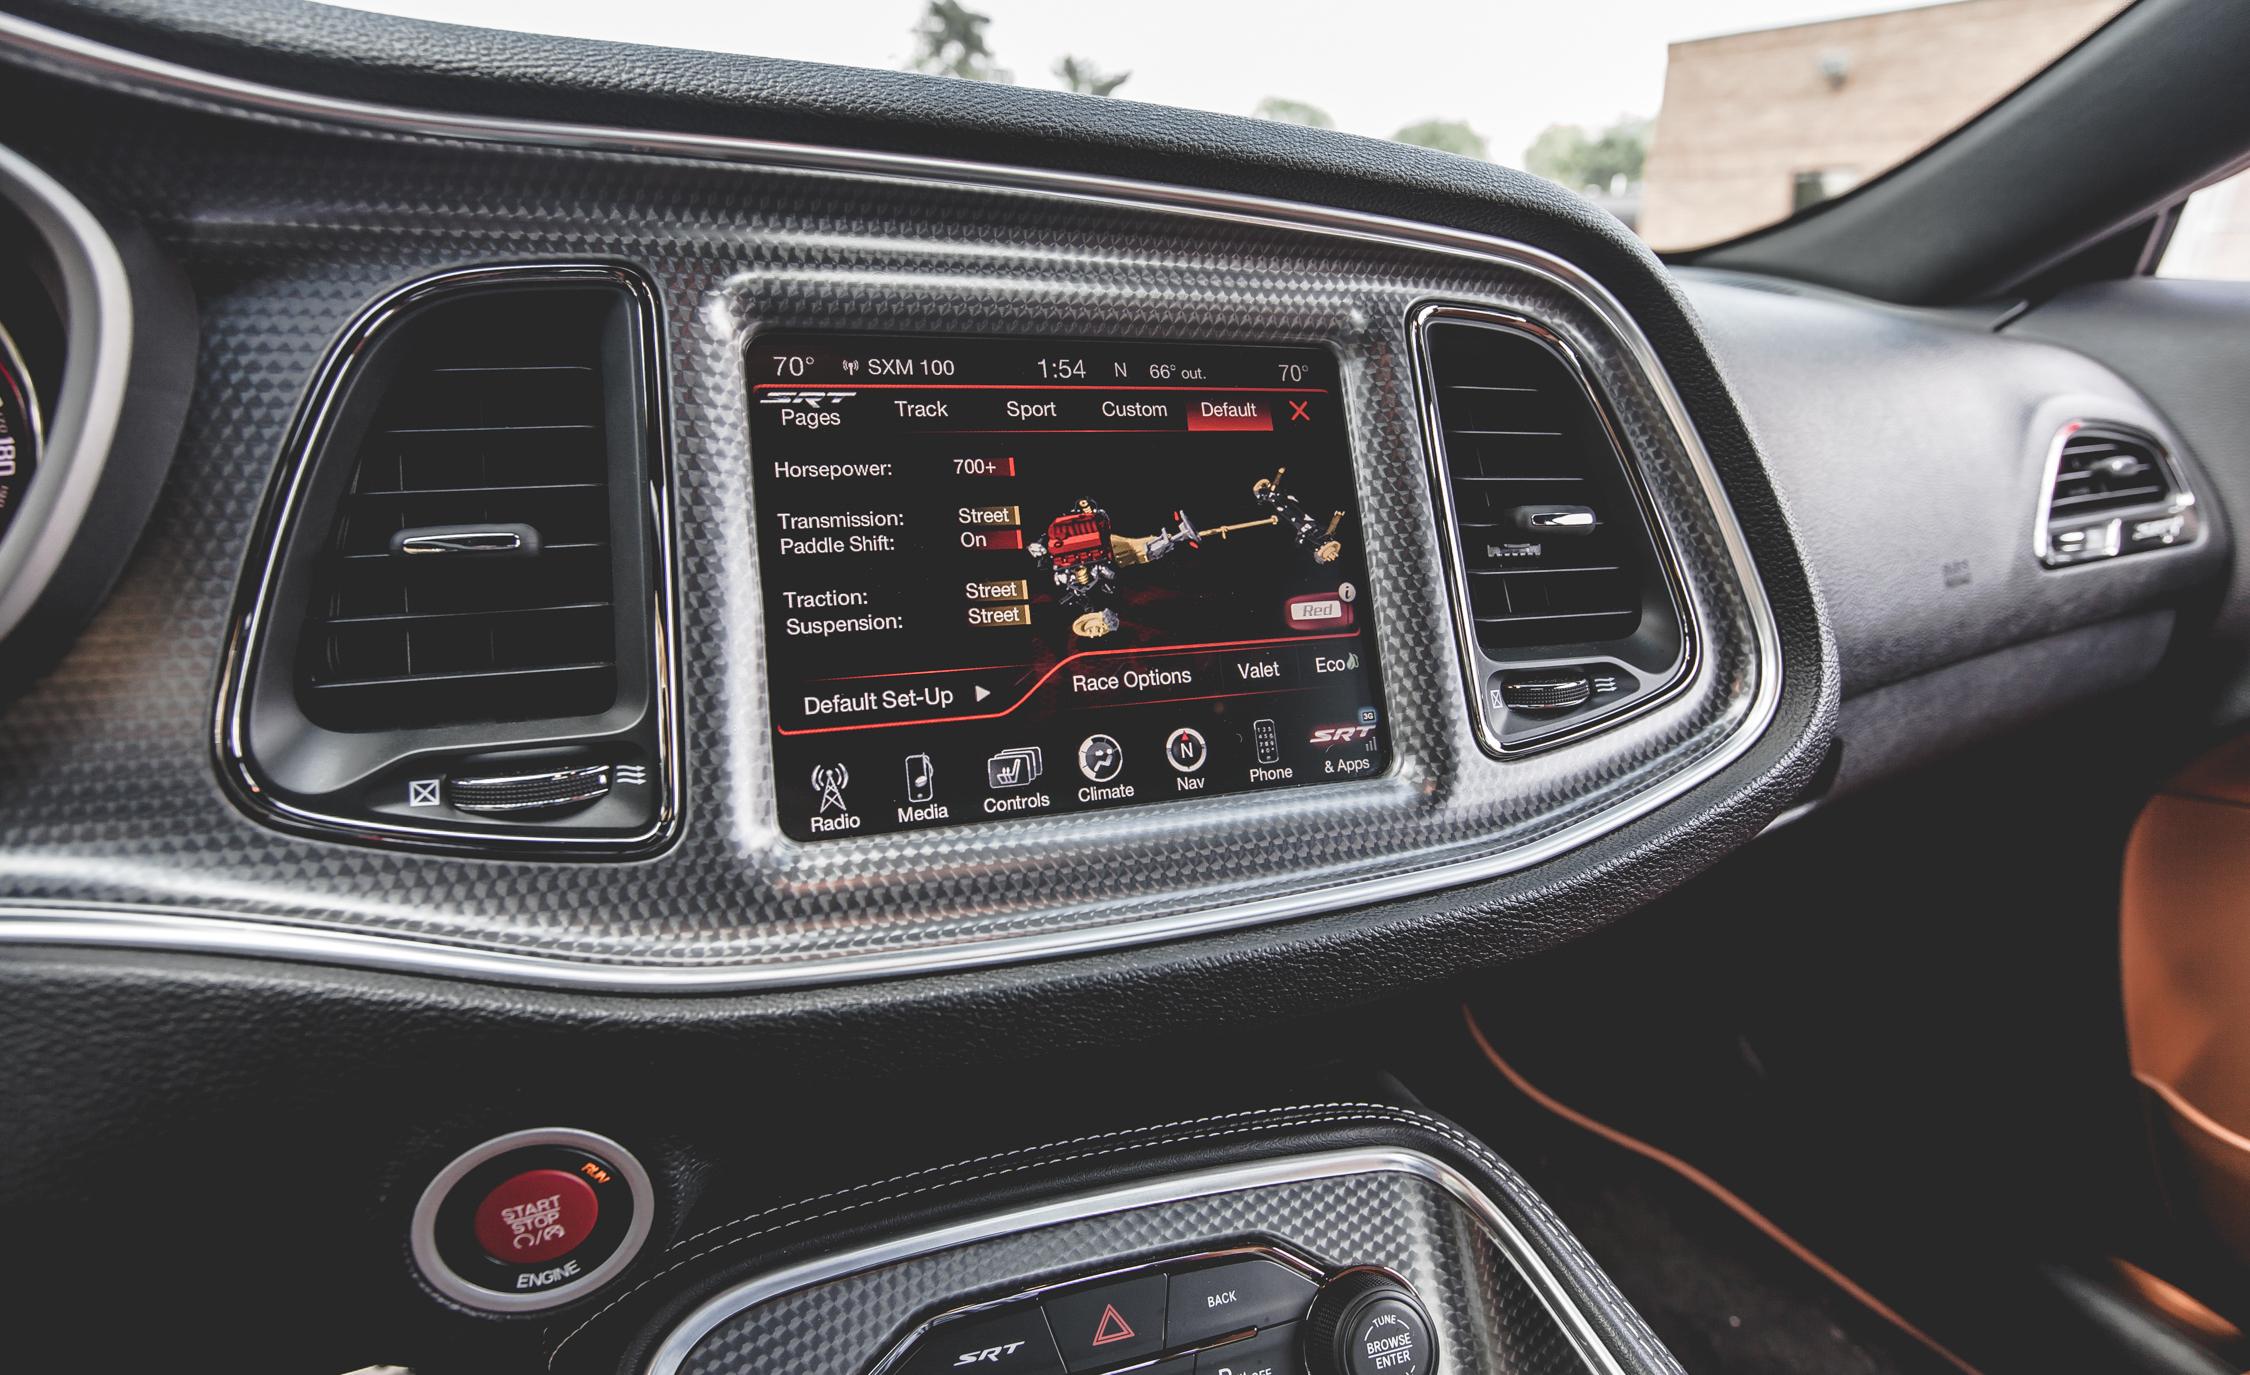 2015 Dodge Challenger SRT Hellcat Interior Center Head Unit